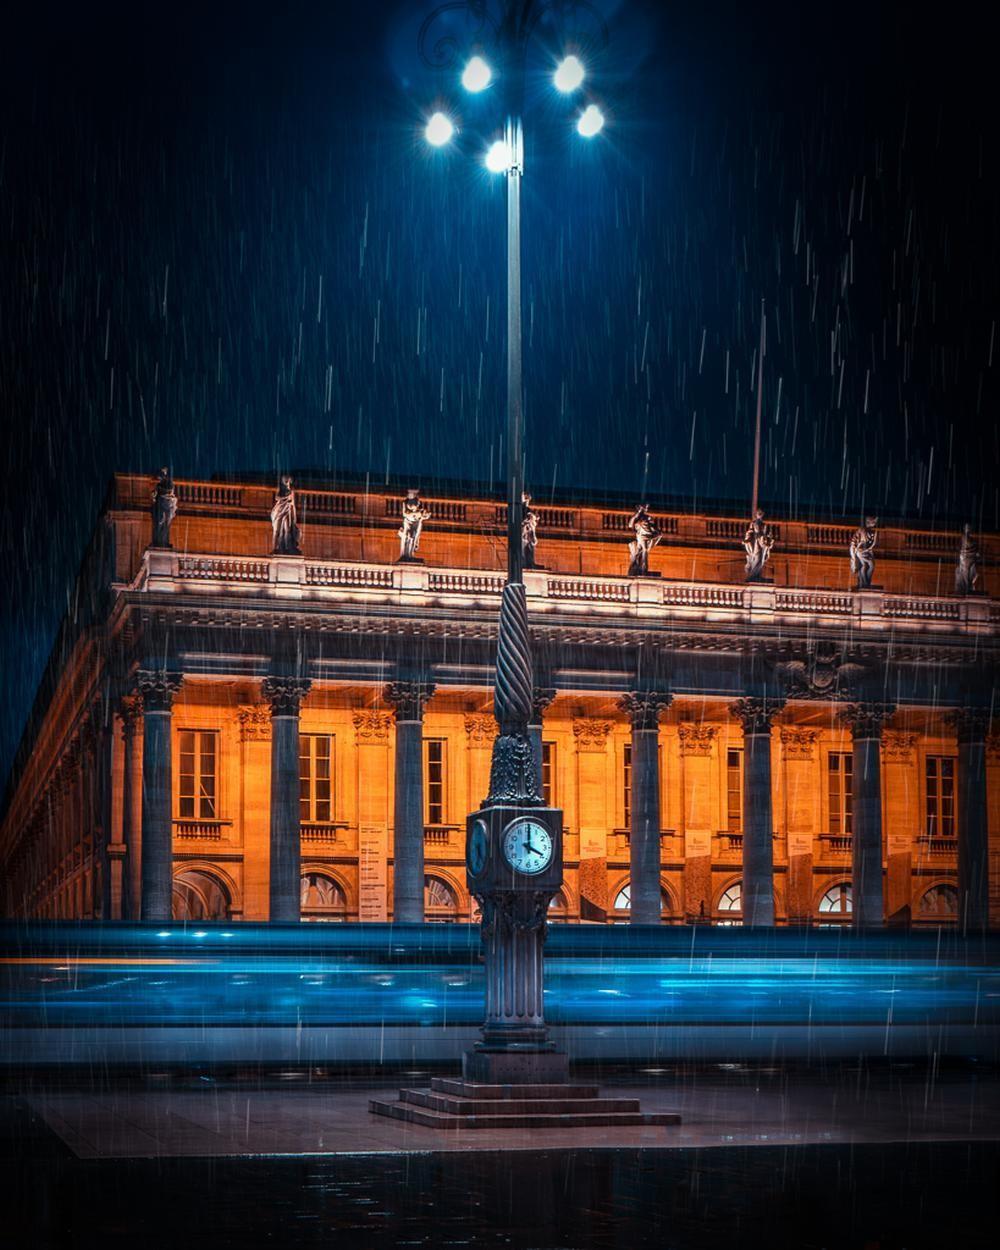 BORDEAUX CITY NIGHT 2